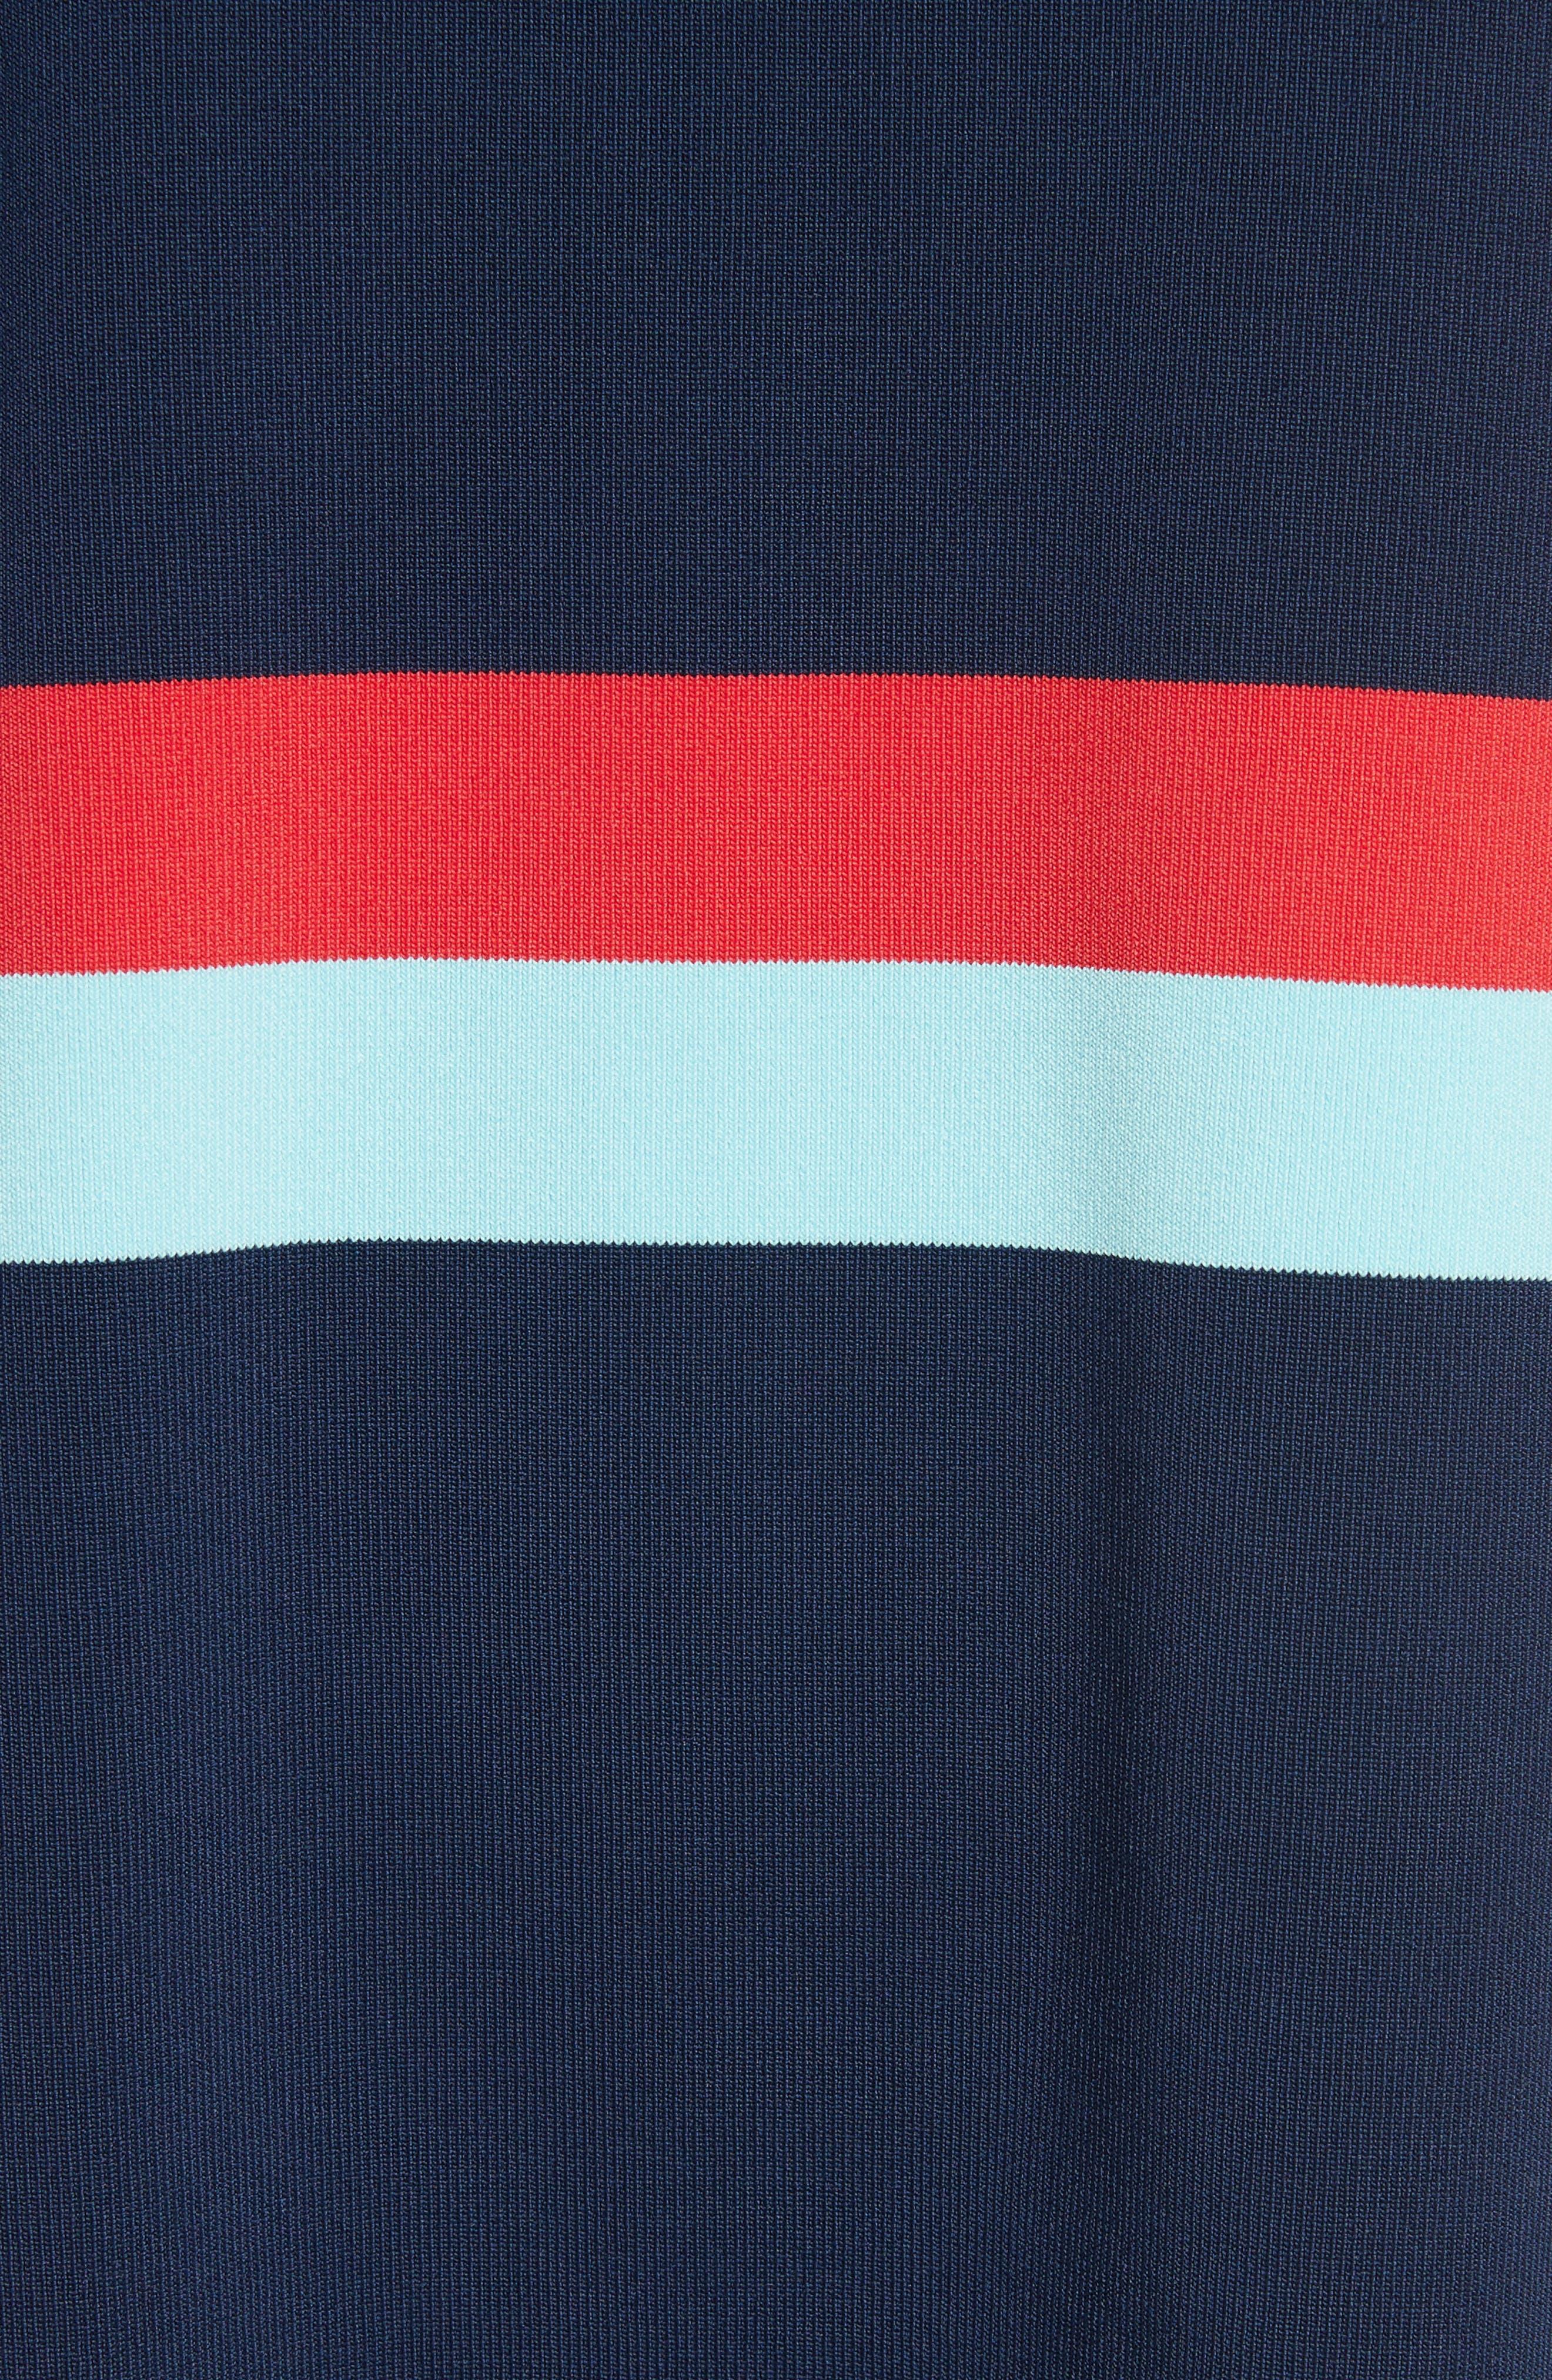 Origami Stripe Knit Dress,                             Alternate thumbnail 5, color,                             Dark Blue